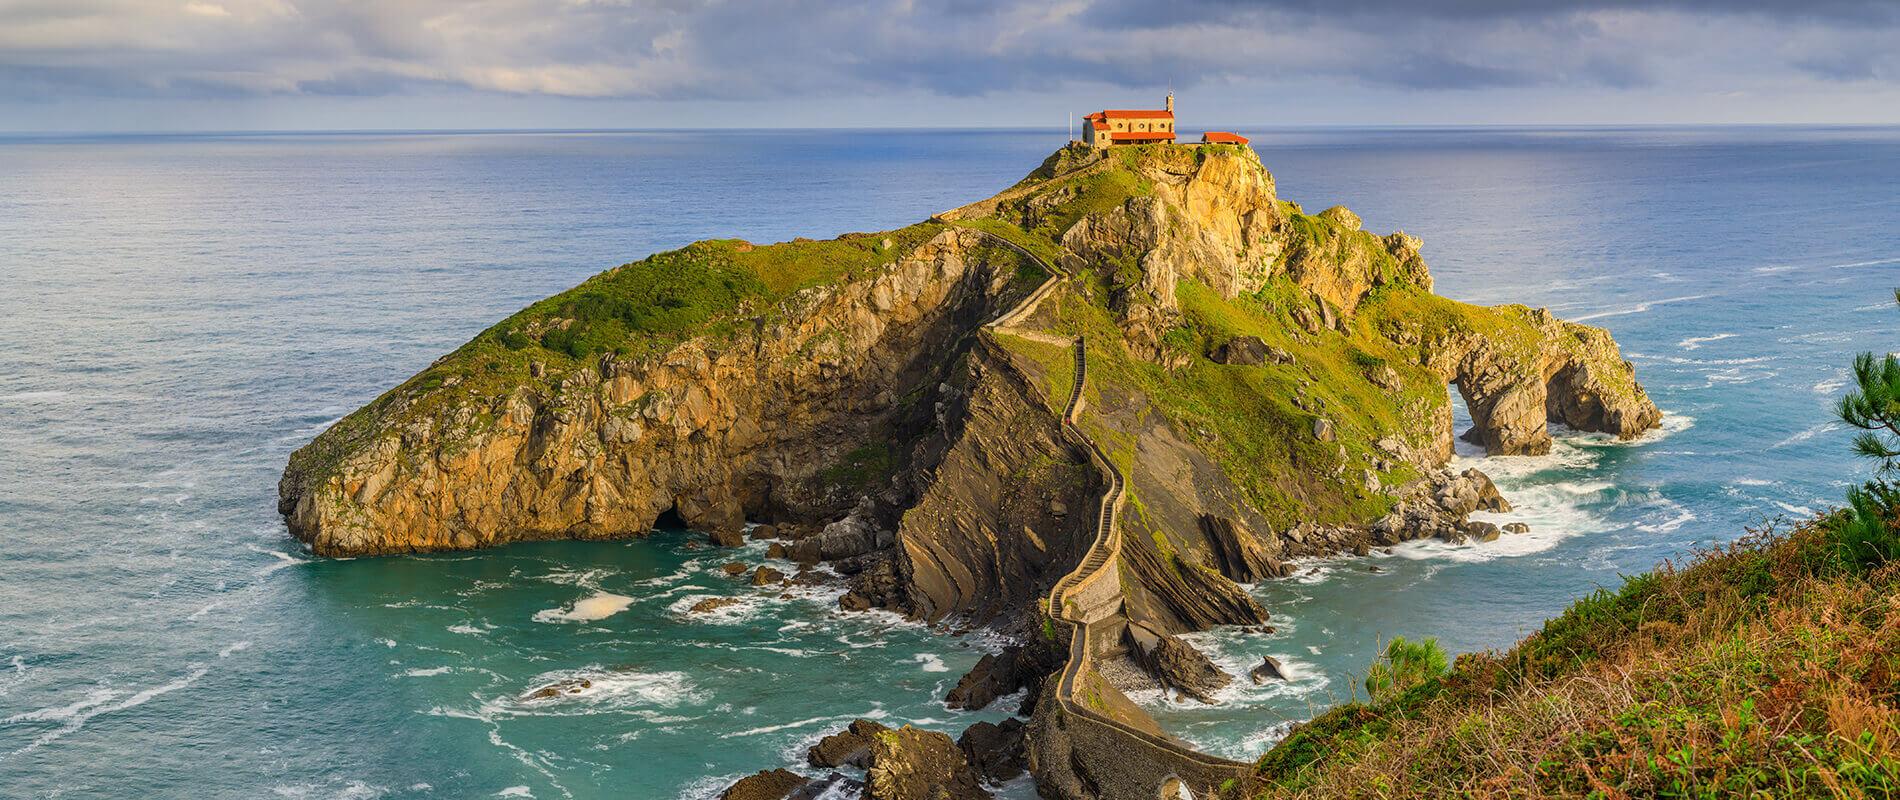 San Juan de Gaztelugatxe, a Breathtaking Ocean Pathway